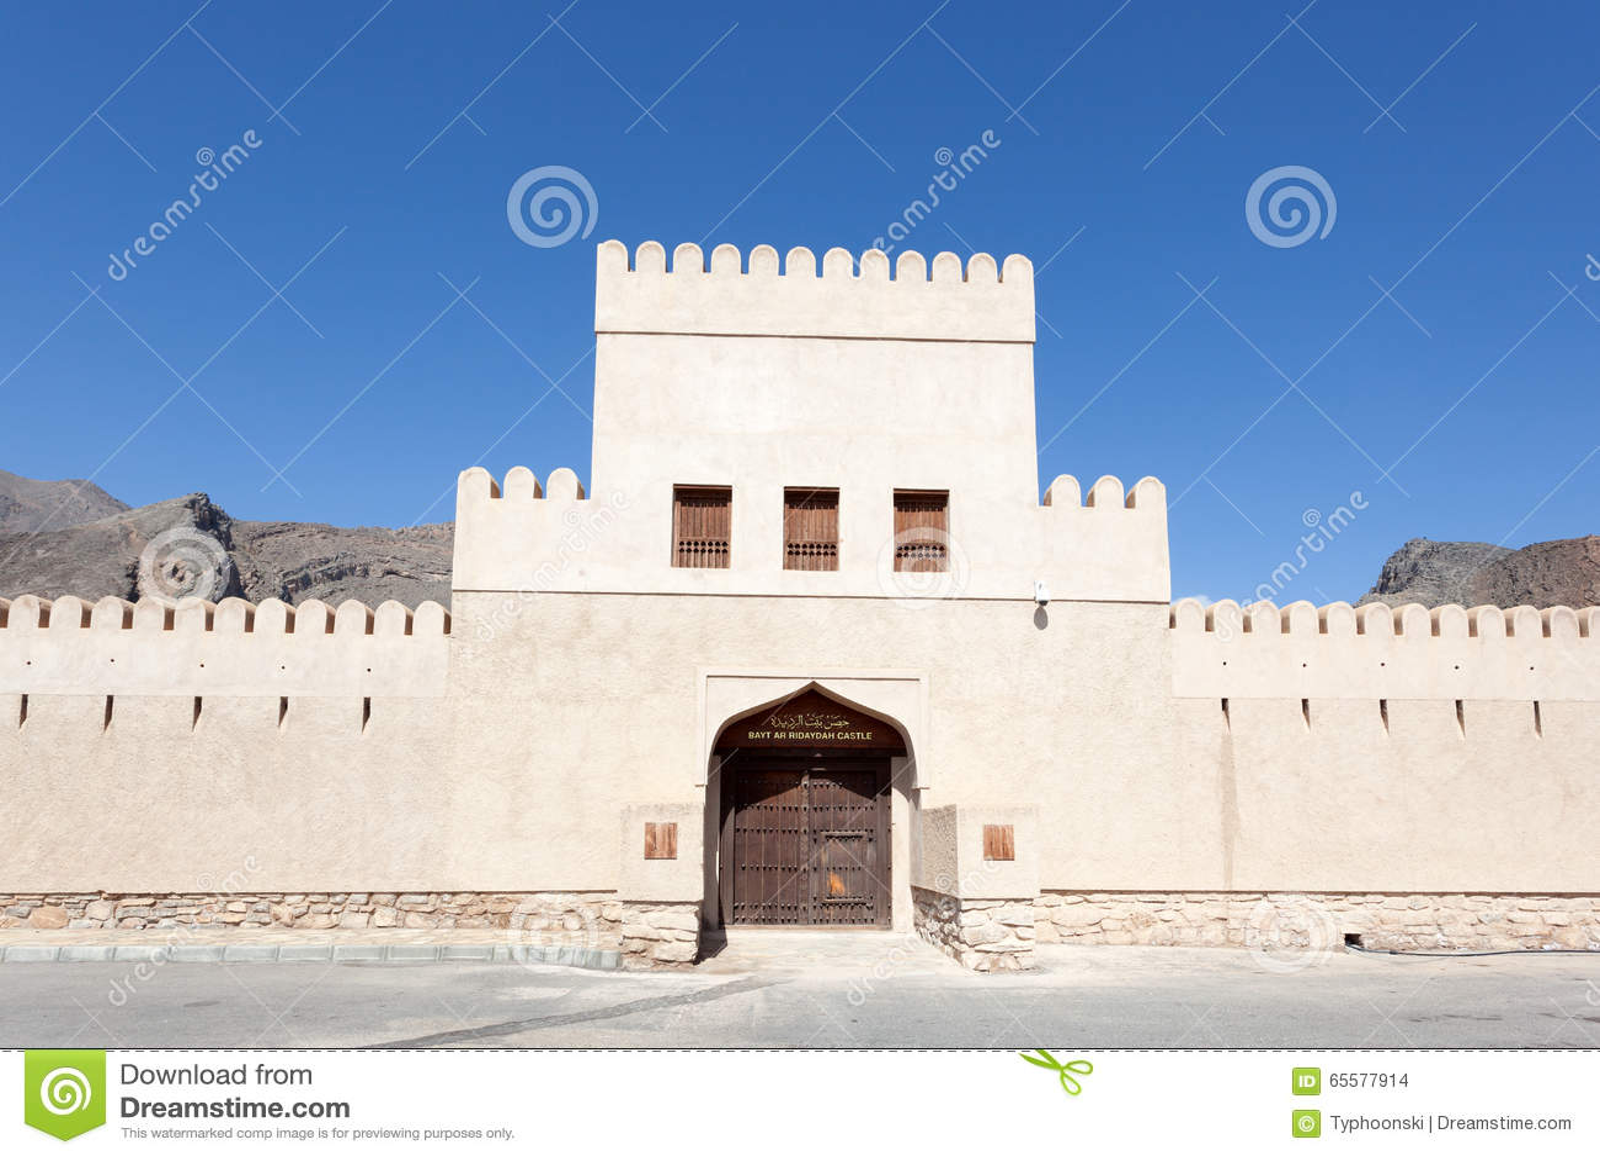 Castelo de Bayt AR Ridaydah em Omã